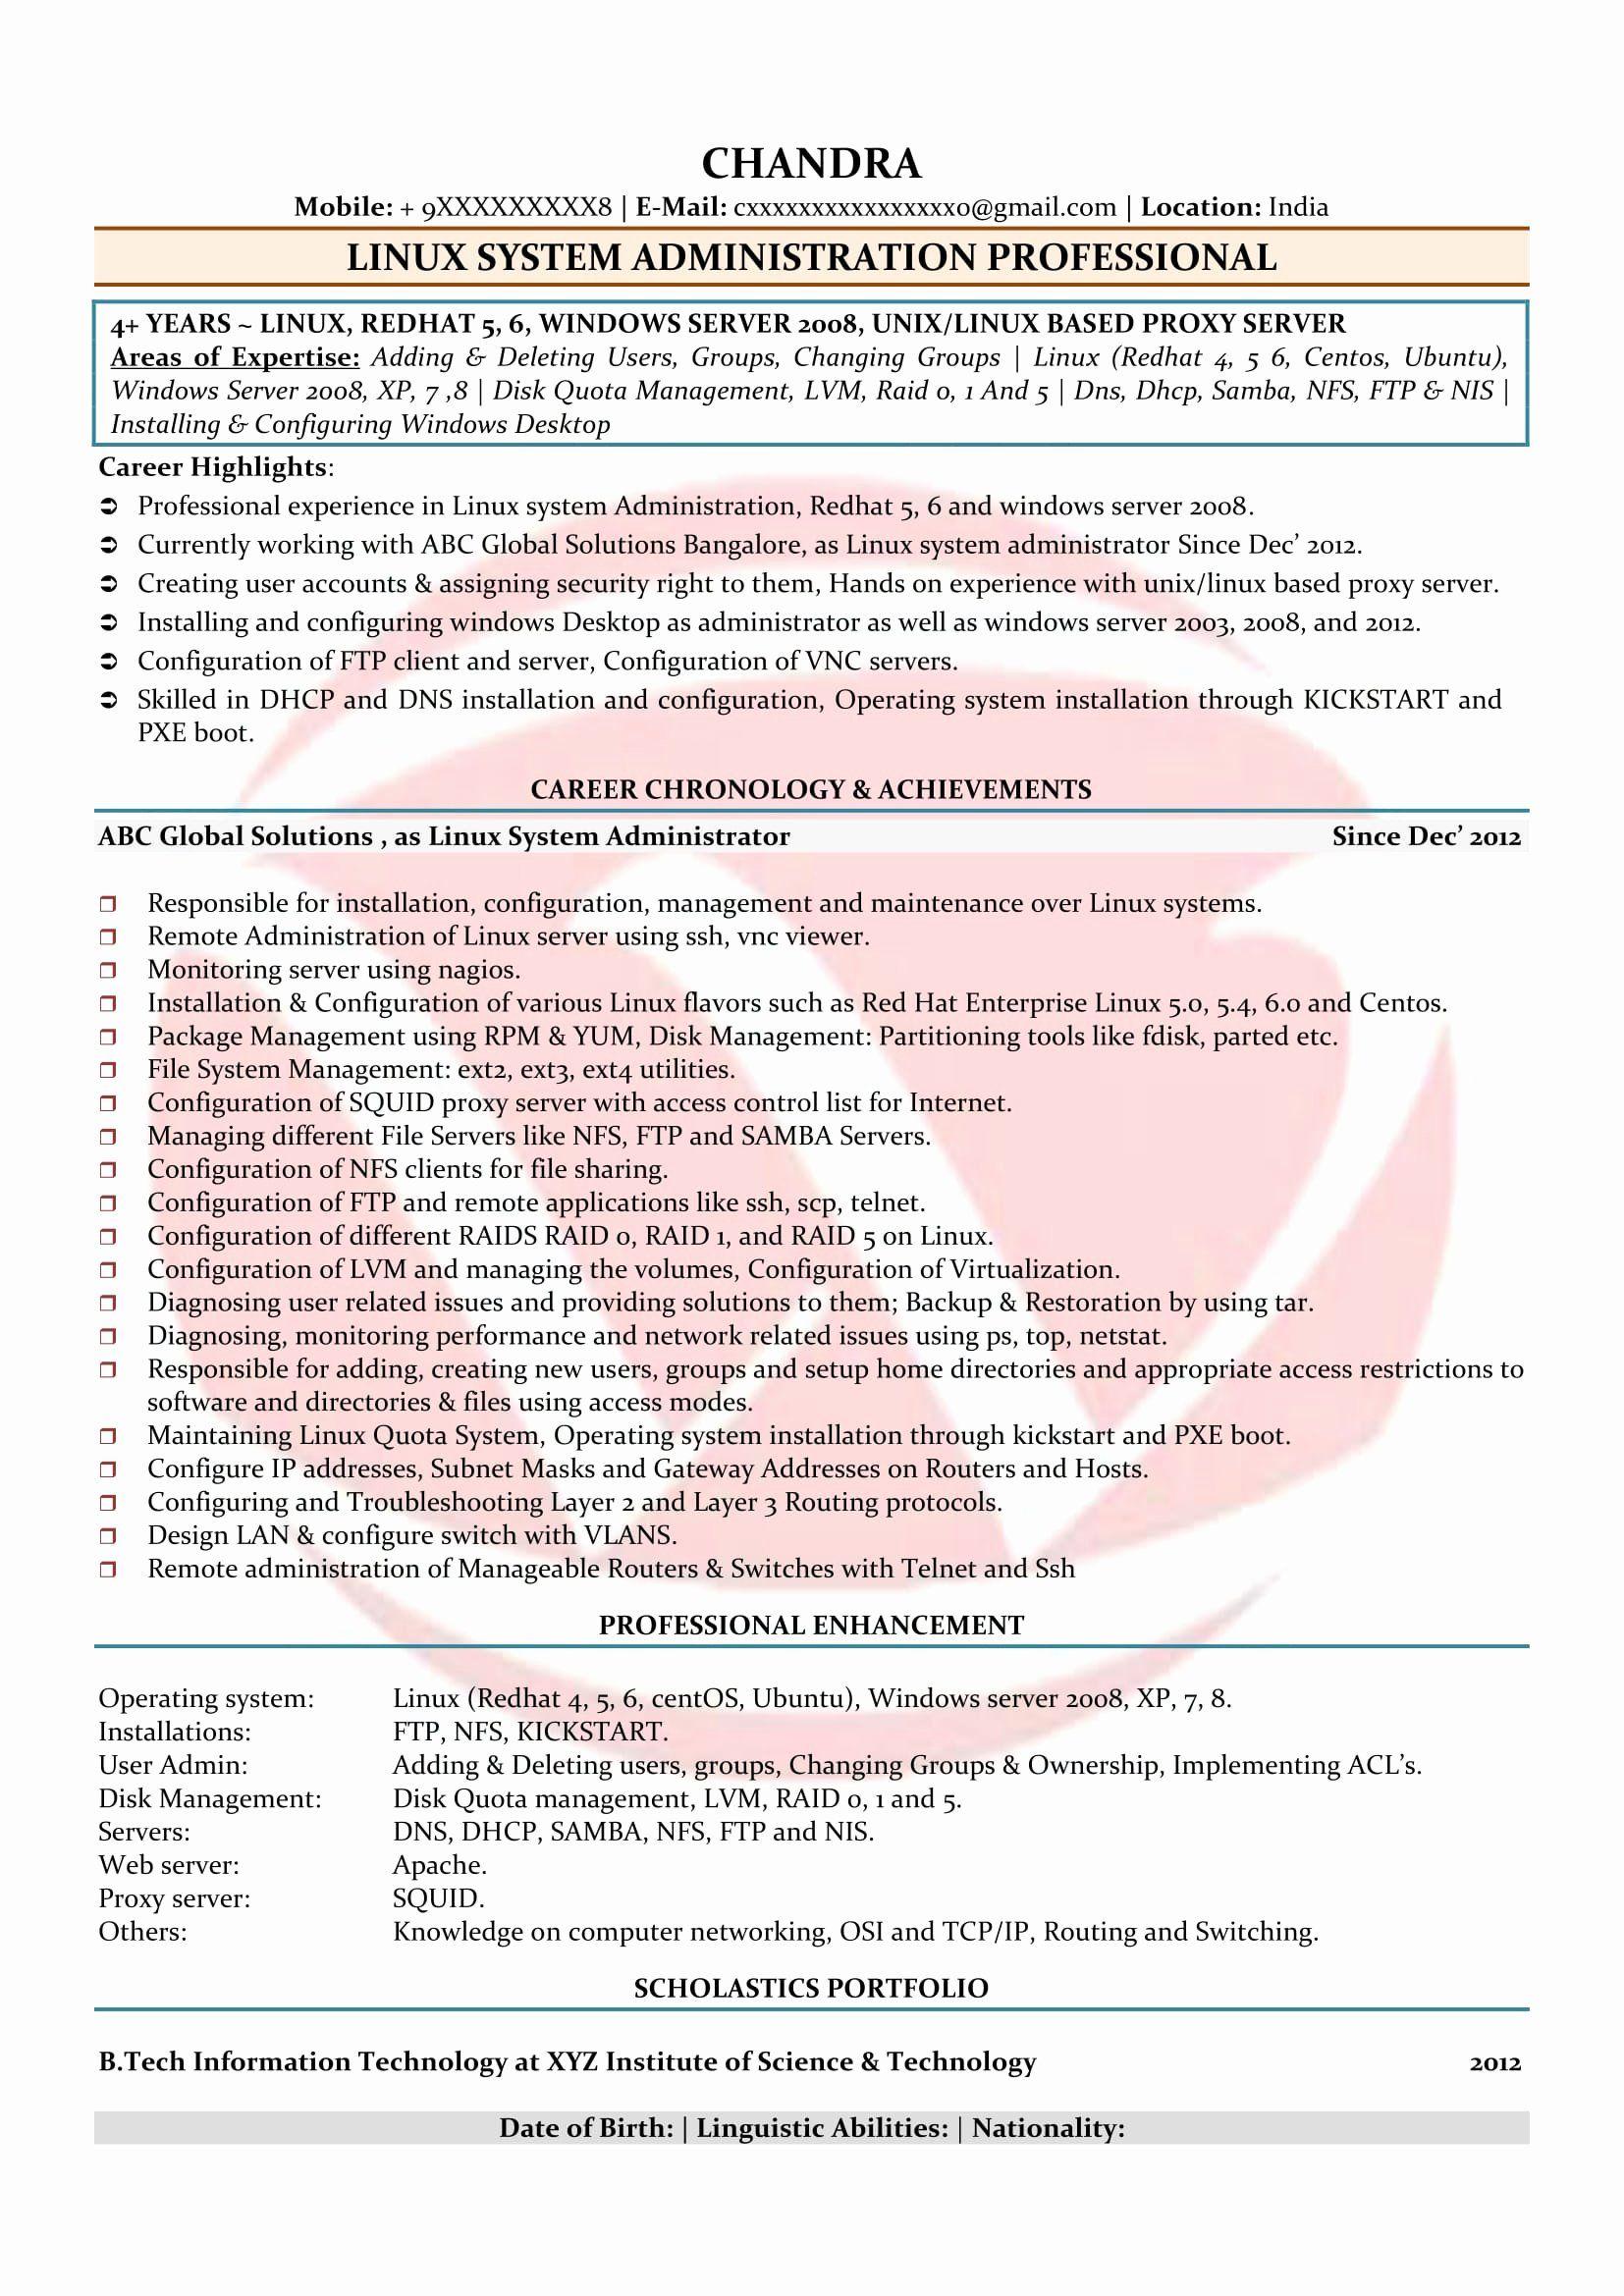 Entry Level Network Administrator Resume Elegant Linux Admin Sample Resumes Download Resume Format Templates In 2020 Resume Format Resume Format For Freshers Resume